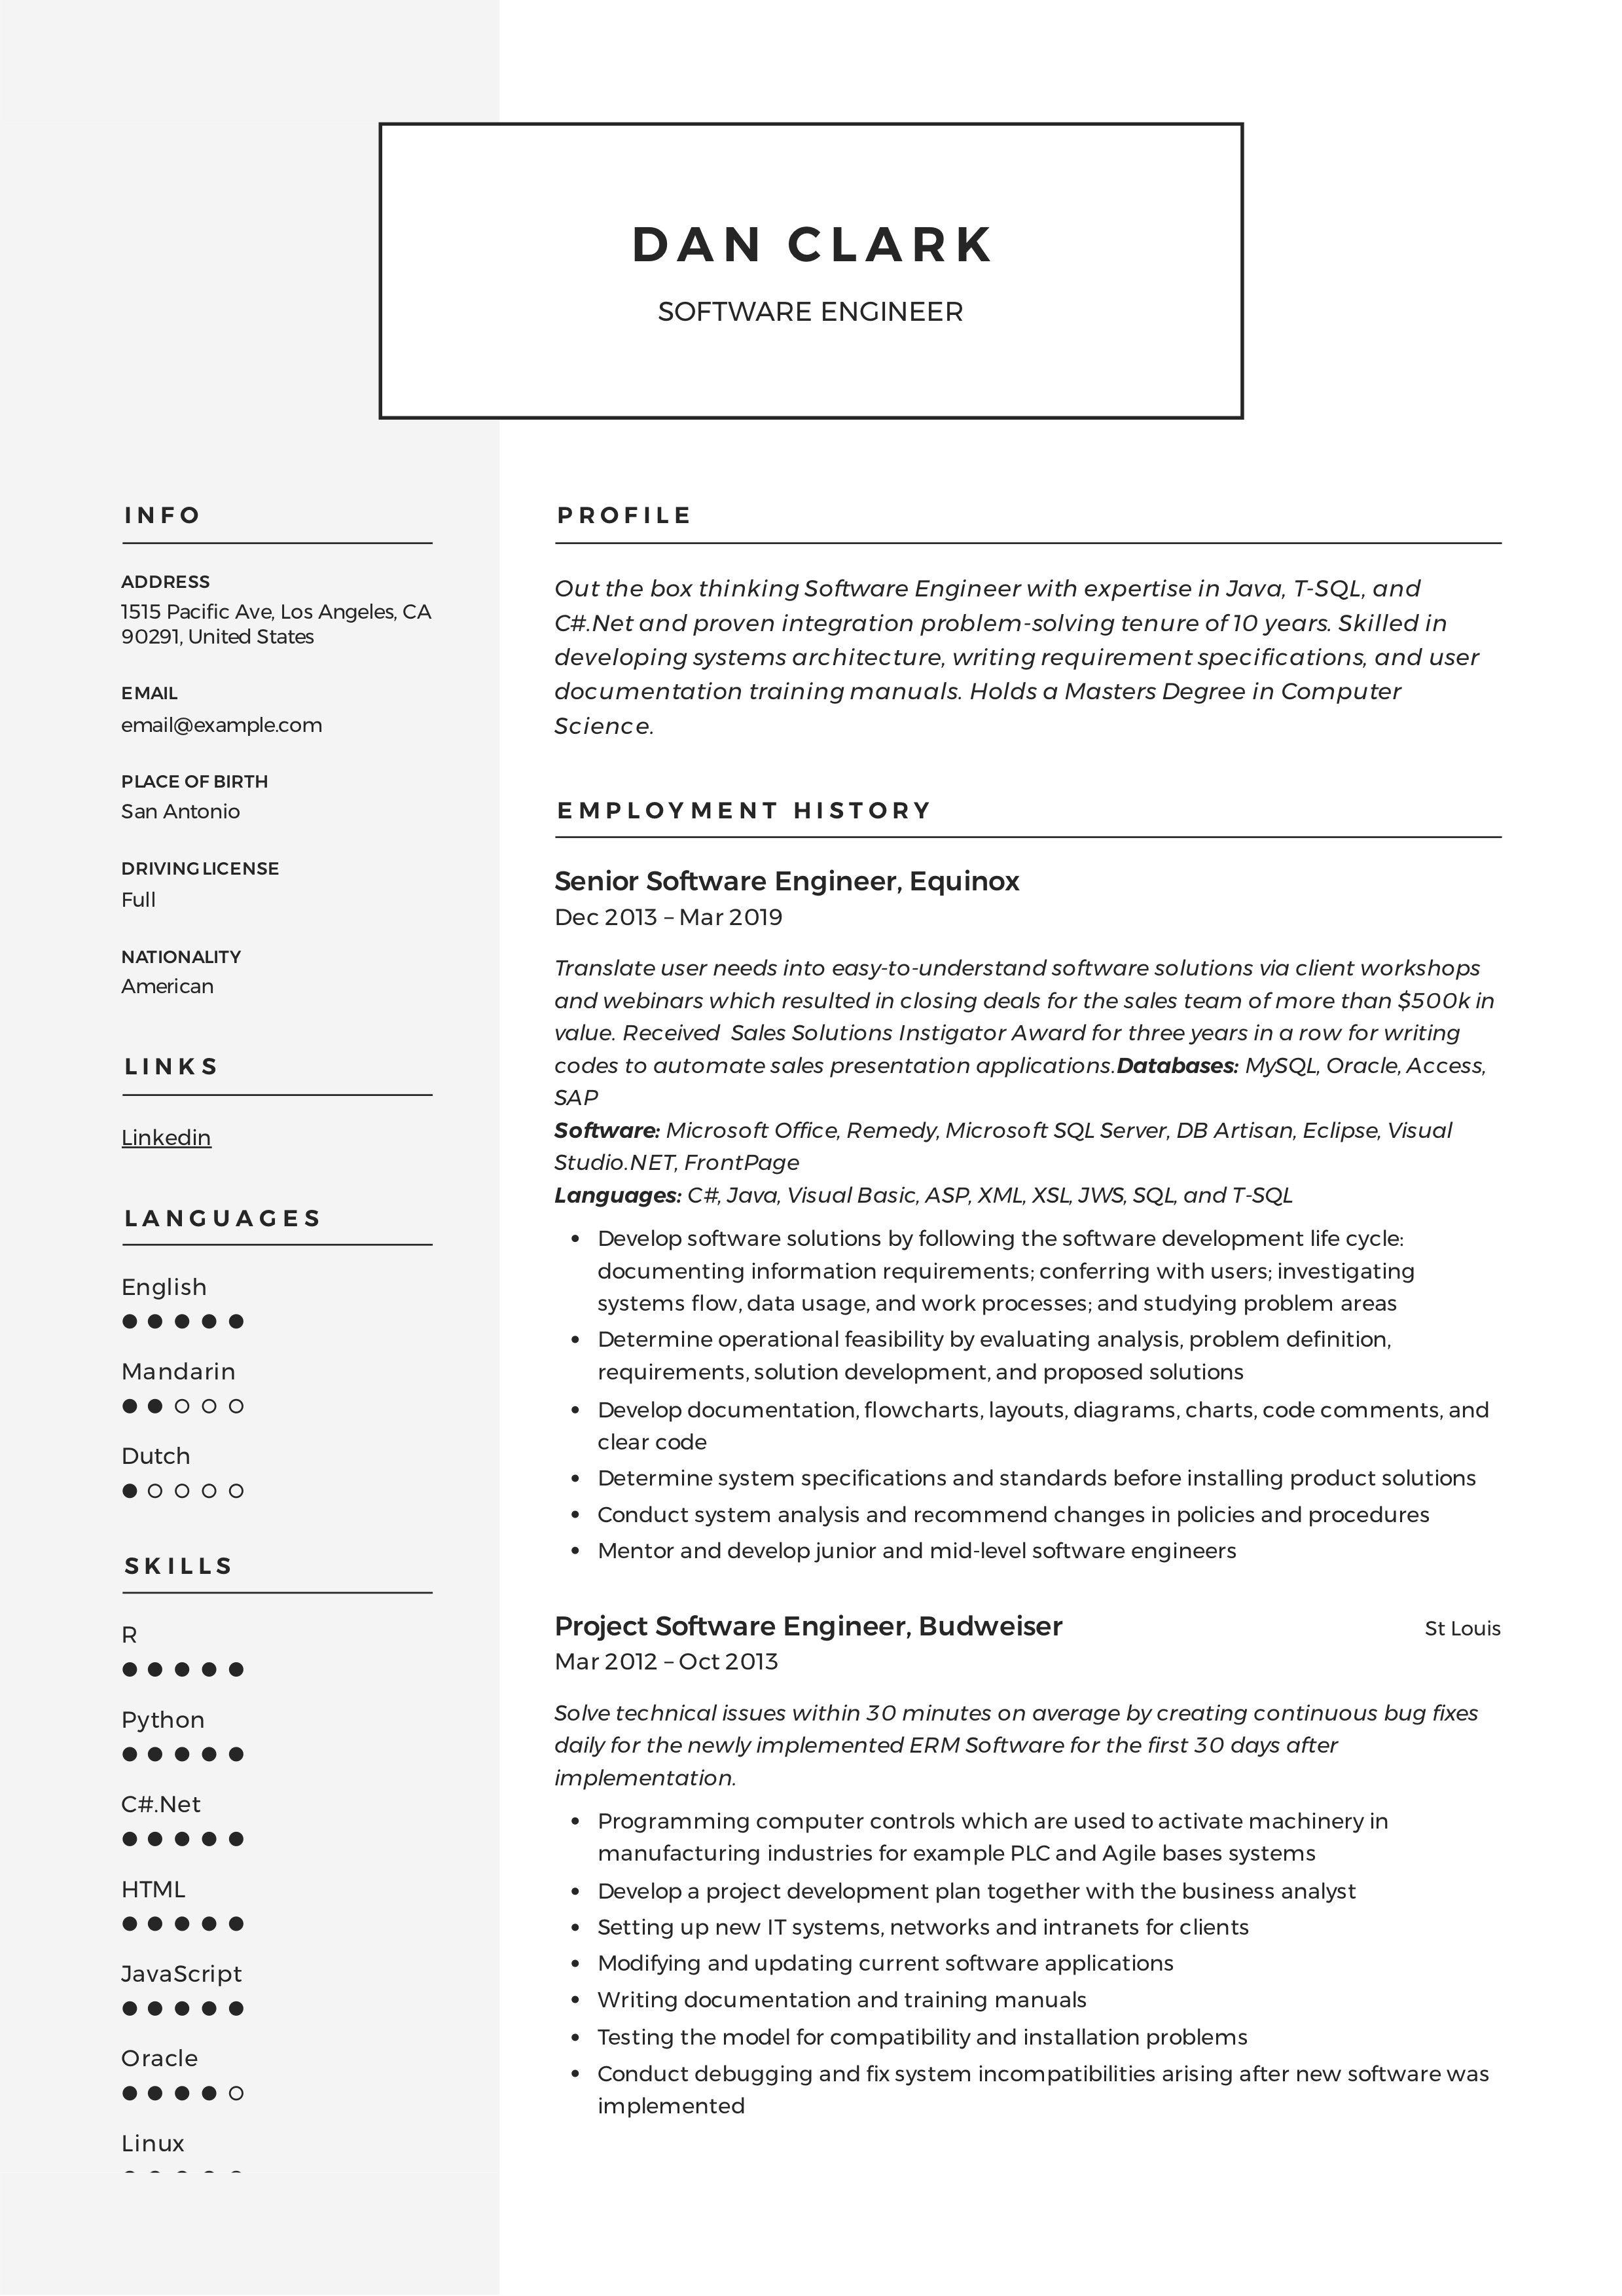 Modern software engineer resume template design tips